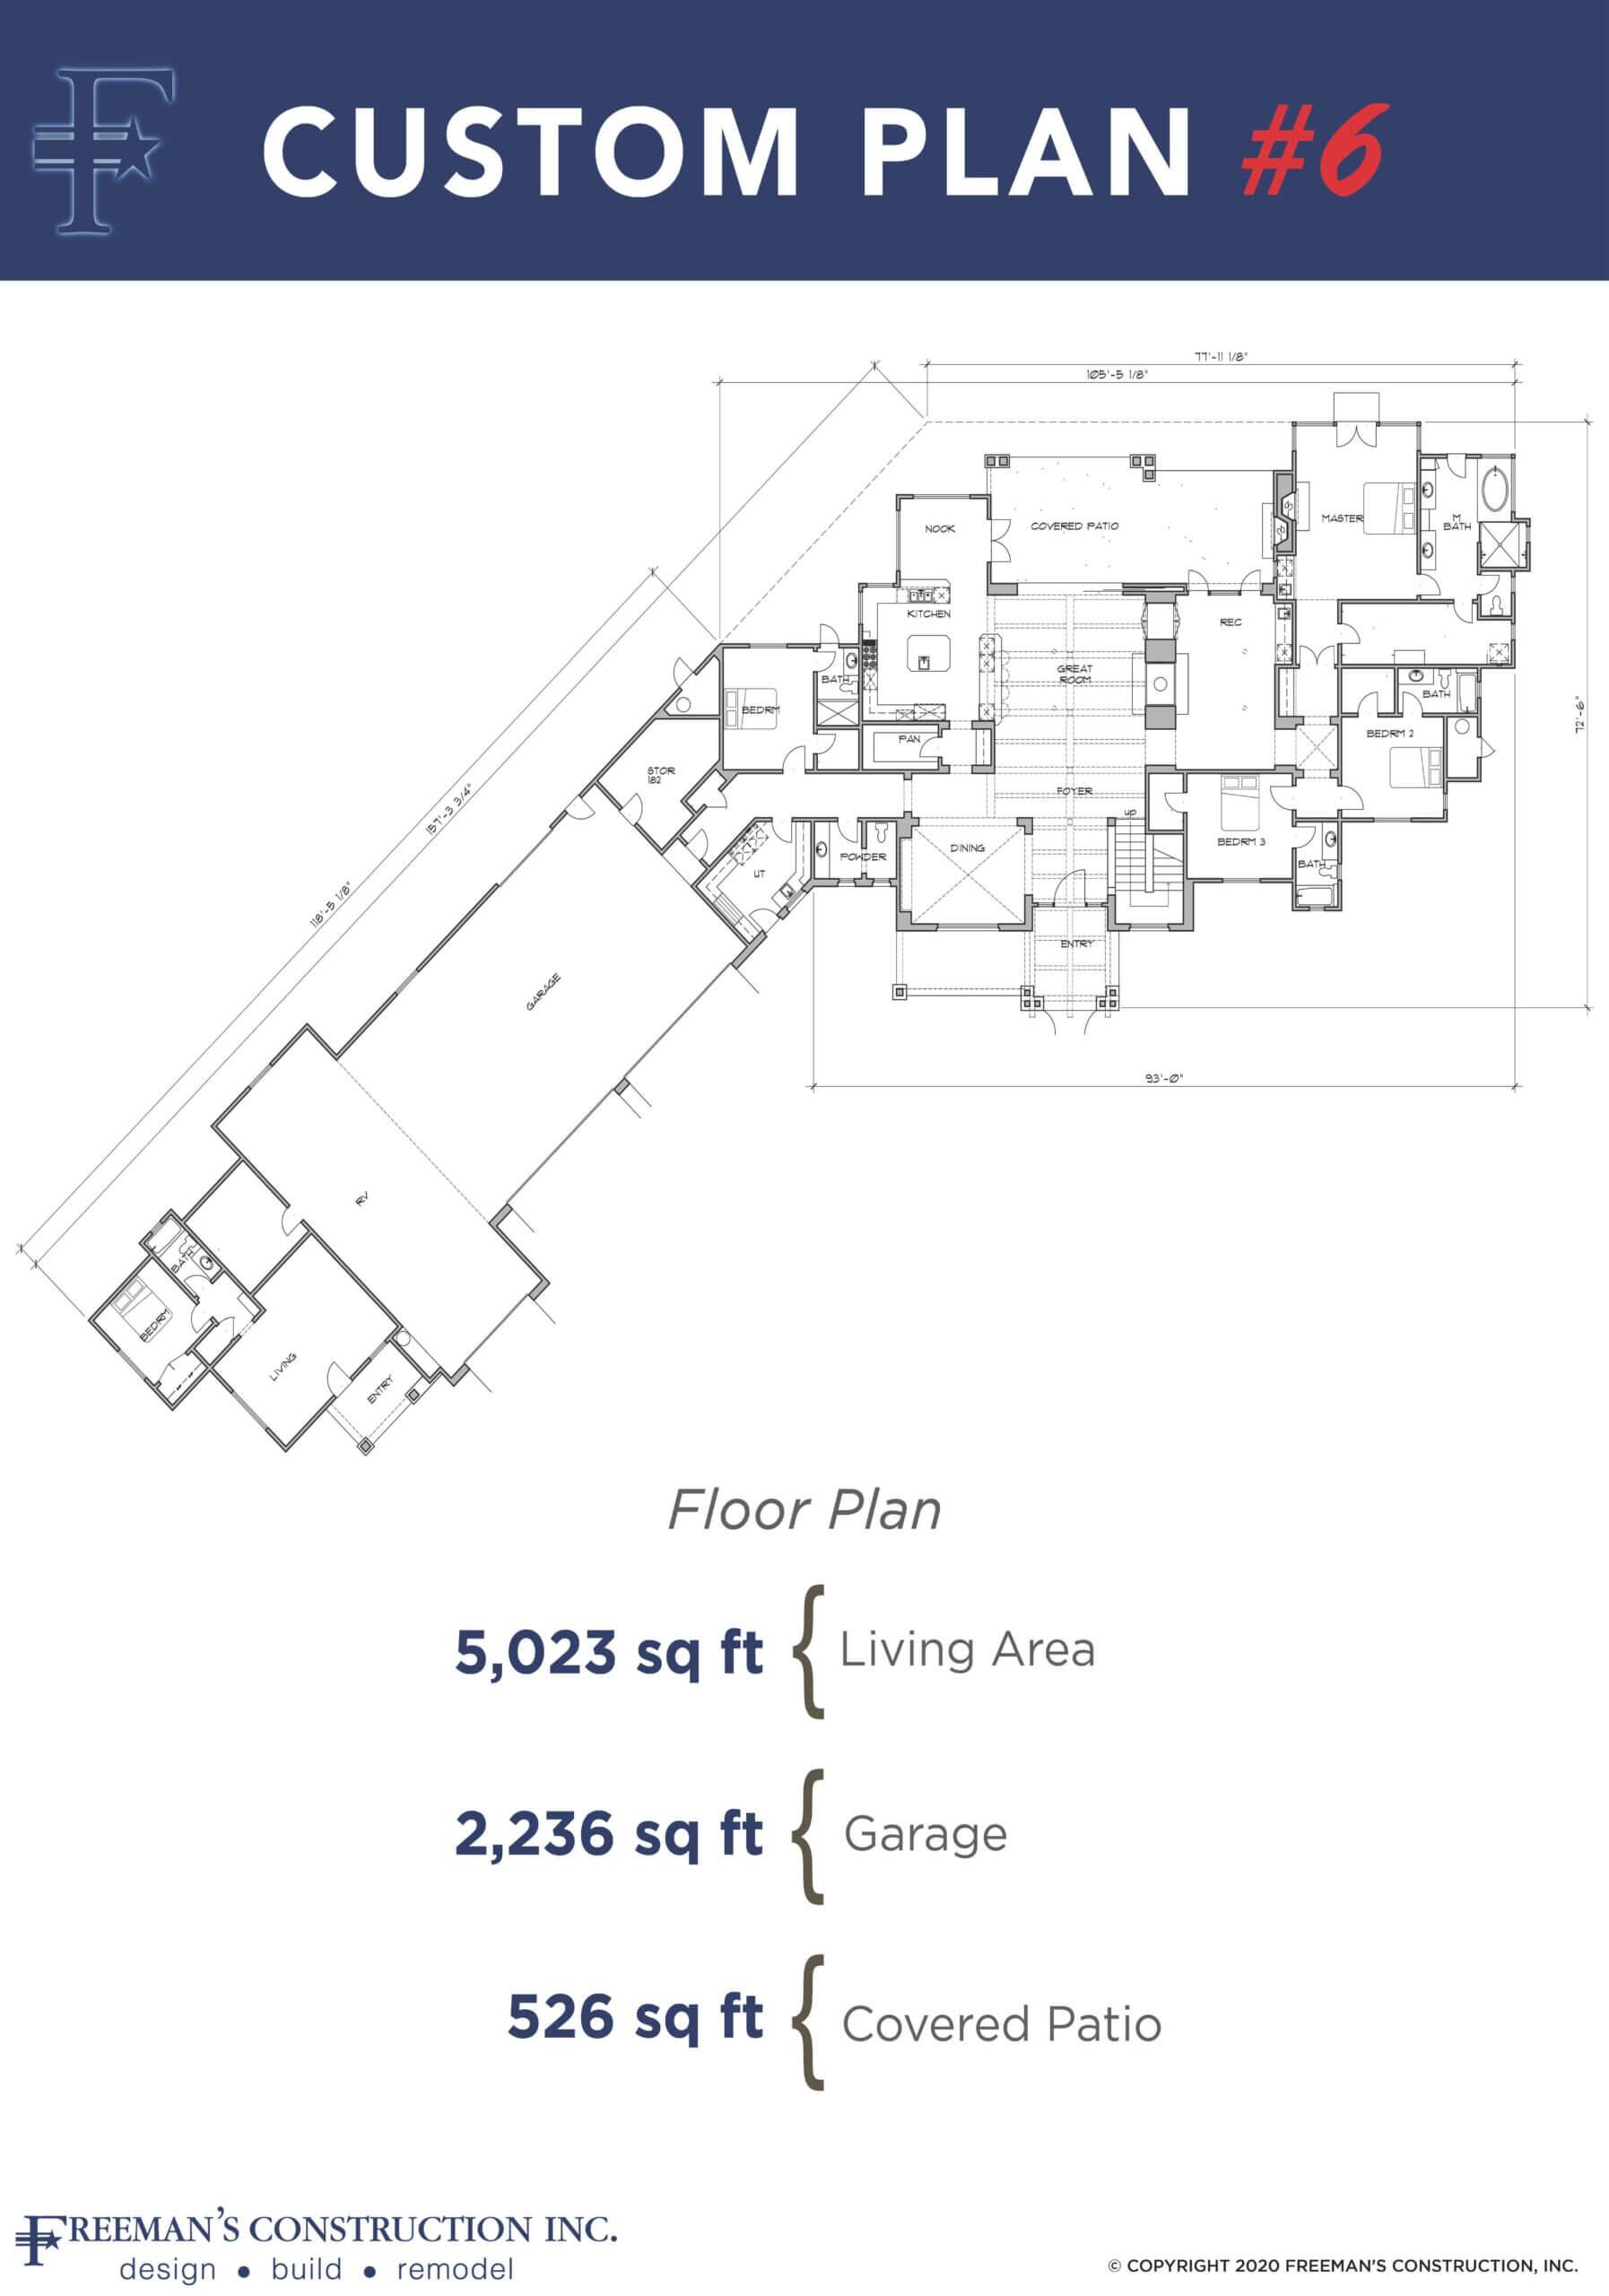 custom-home-floor-plan-6-in-san-diego-county-ca-by-freemans-construction-inc